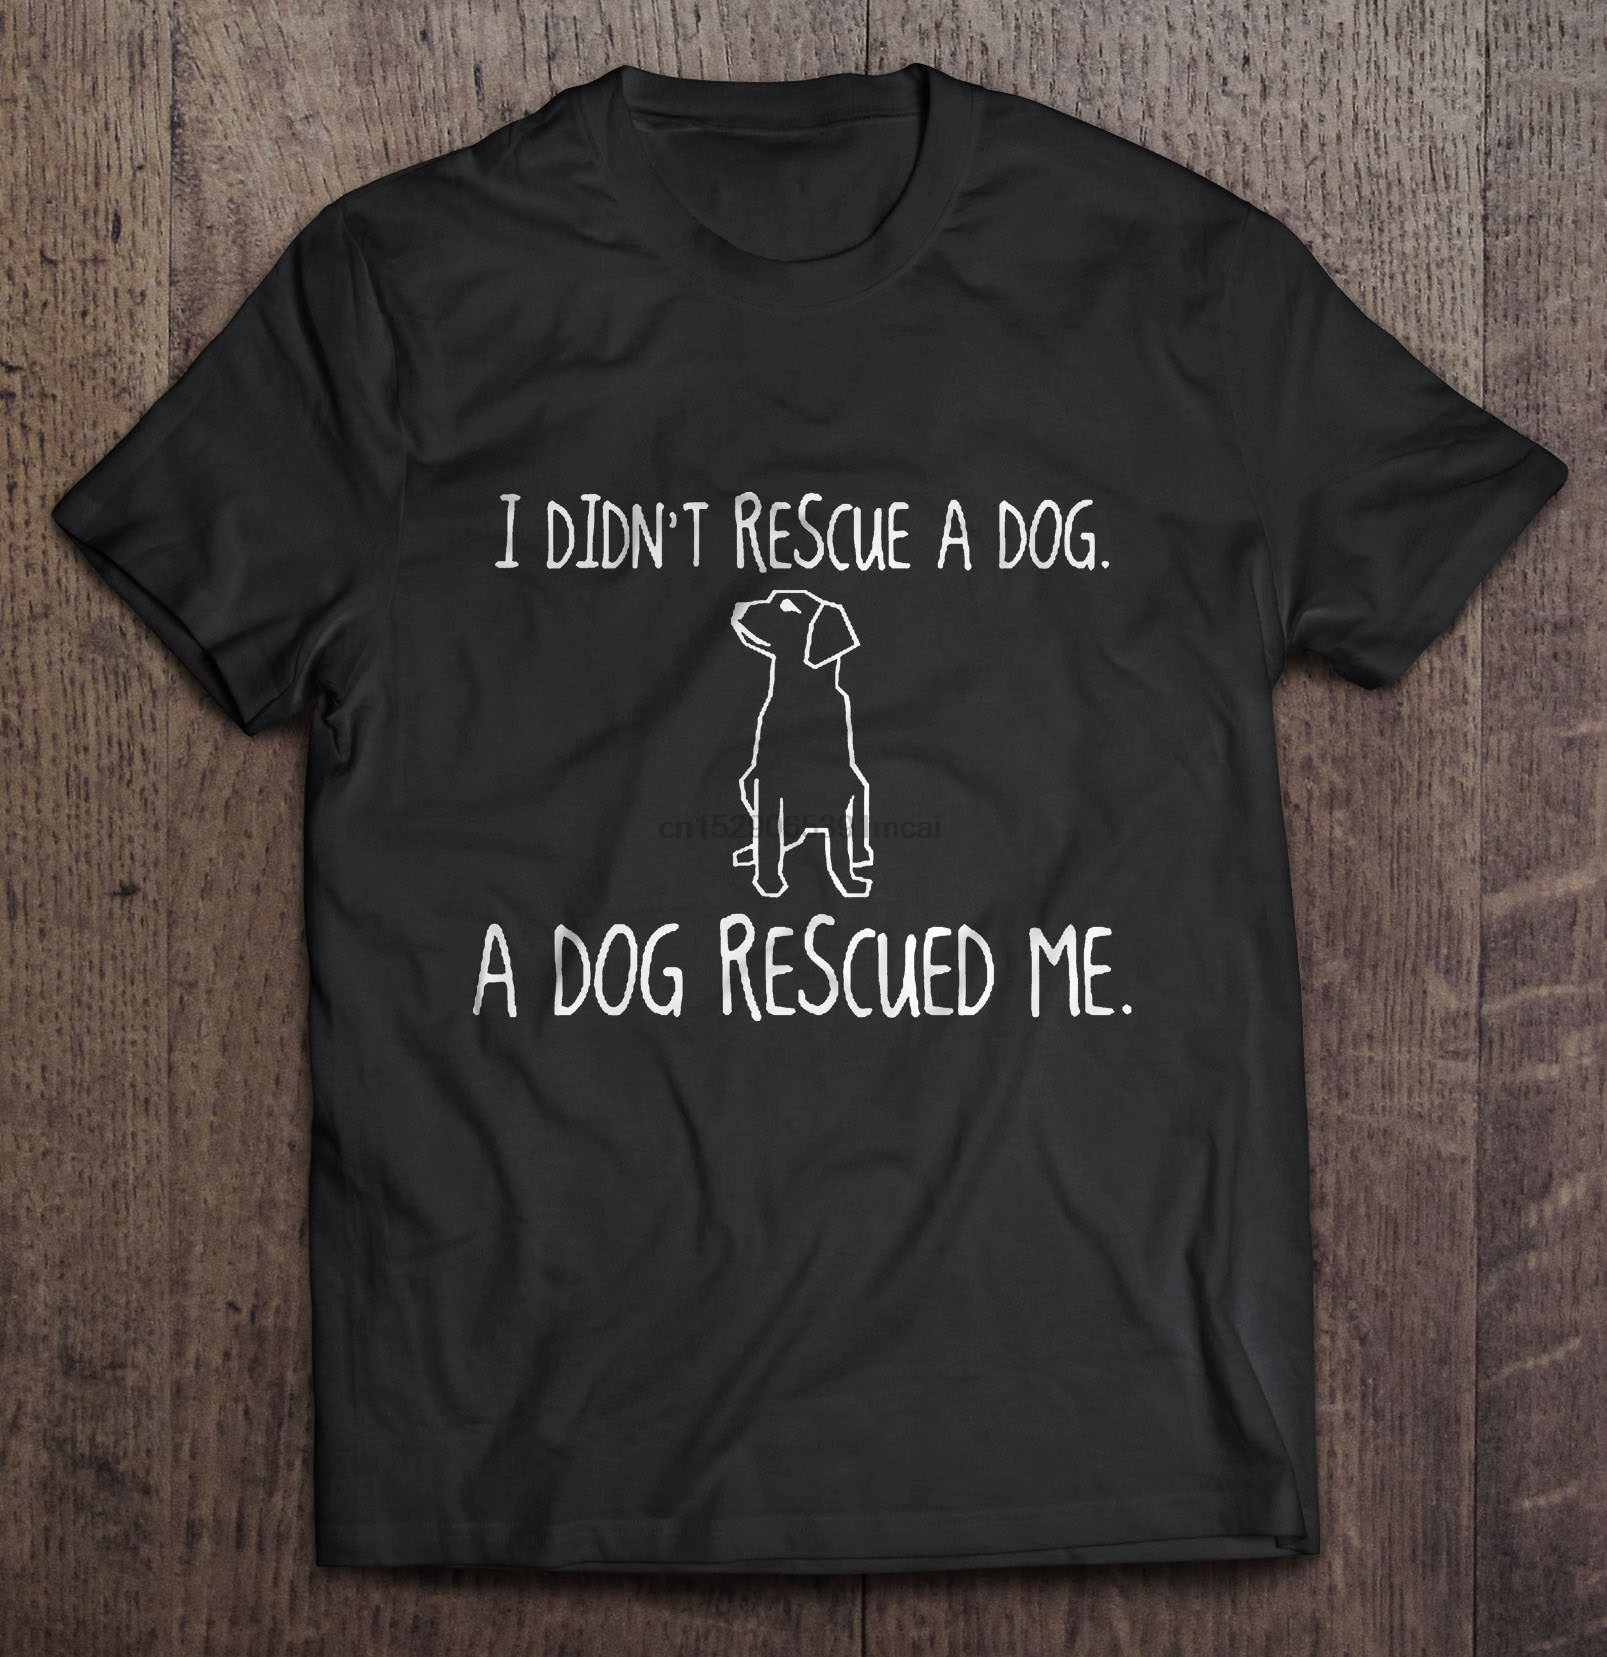 Camiseta divertida A la moda para hombre, camiseta I Didnt Rescue A Dog relieved Me, camiseta para mujer